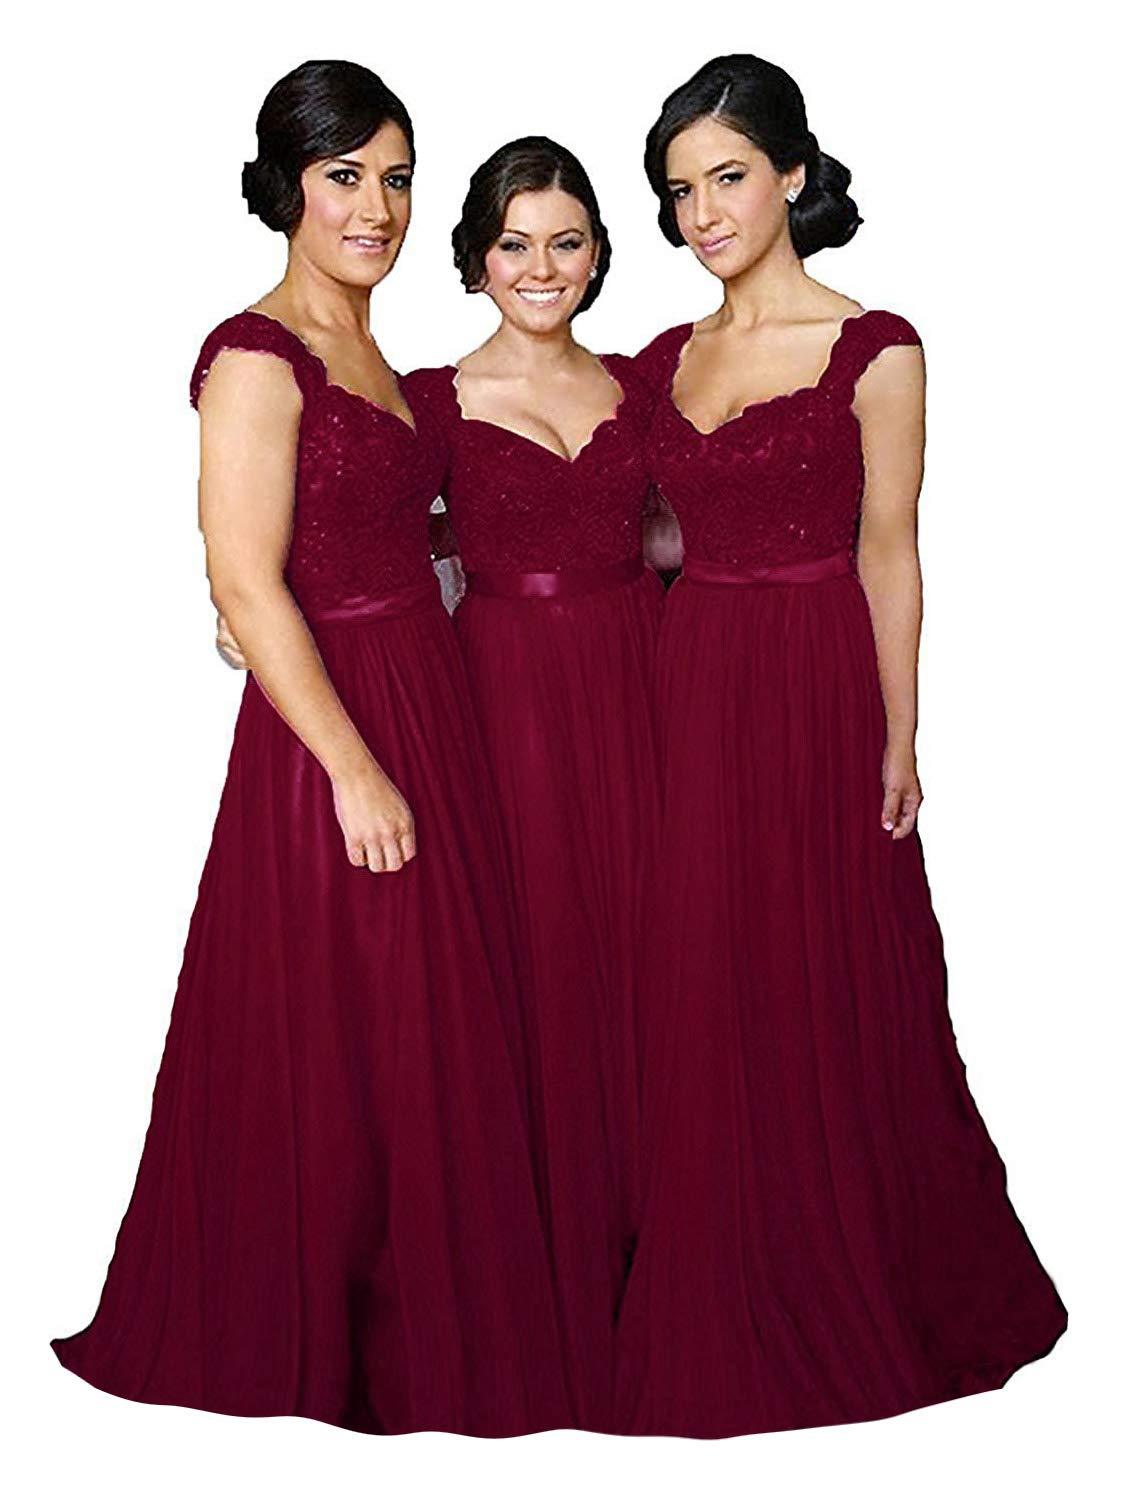 Fanciest Women Cap Sleeve Lace Bridesmaid Dresses Long Wedding Party Gowns Burgundy Us10